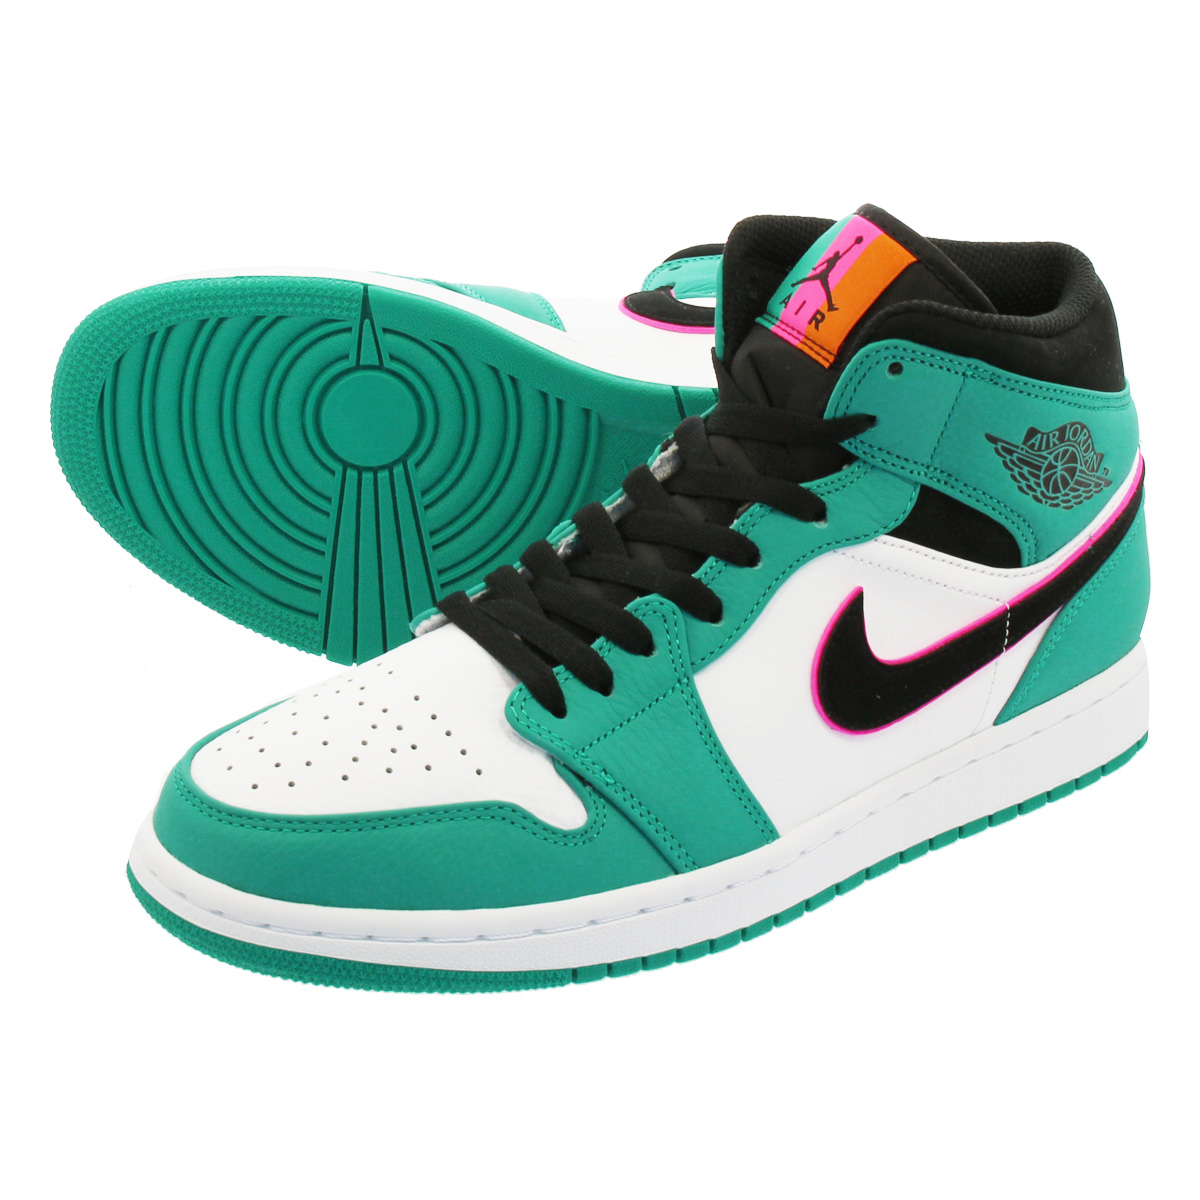 buy popular dbe00 38623 NIKE AIR JORDAN 1 MID SE Nike Air Jordan 1 mid SE TURBO GREEN BLACK HYPER  PINK ORANGE PEEL 852,542-306